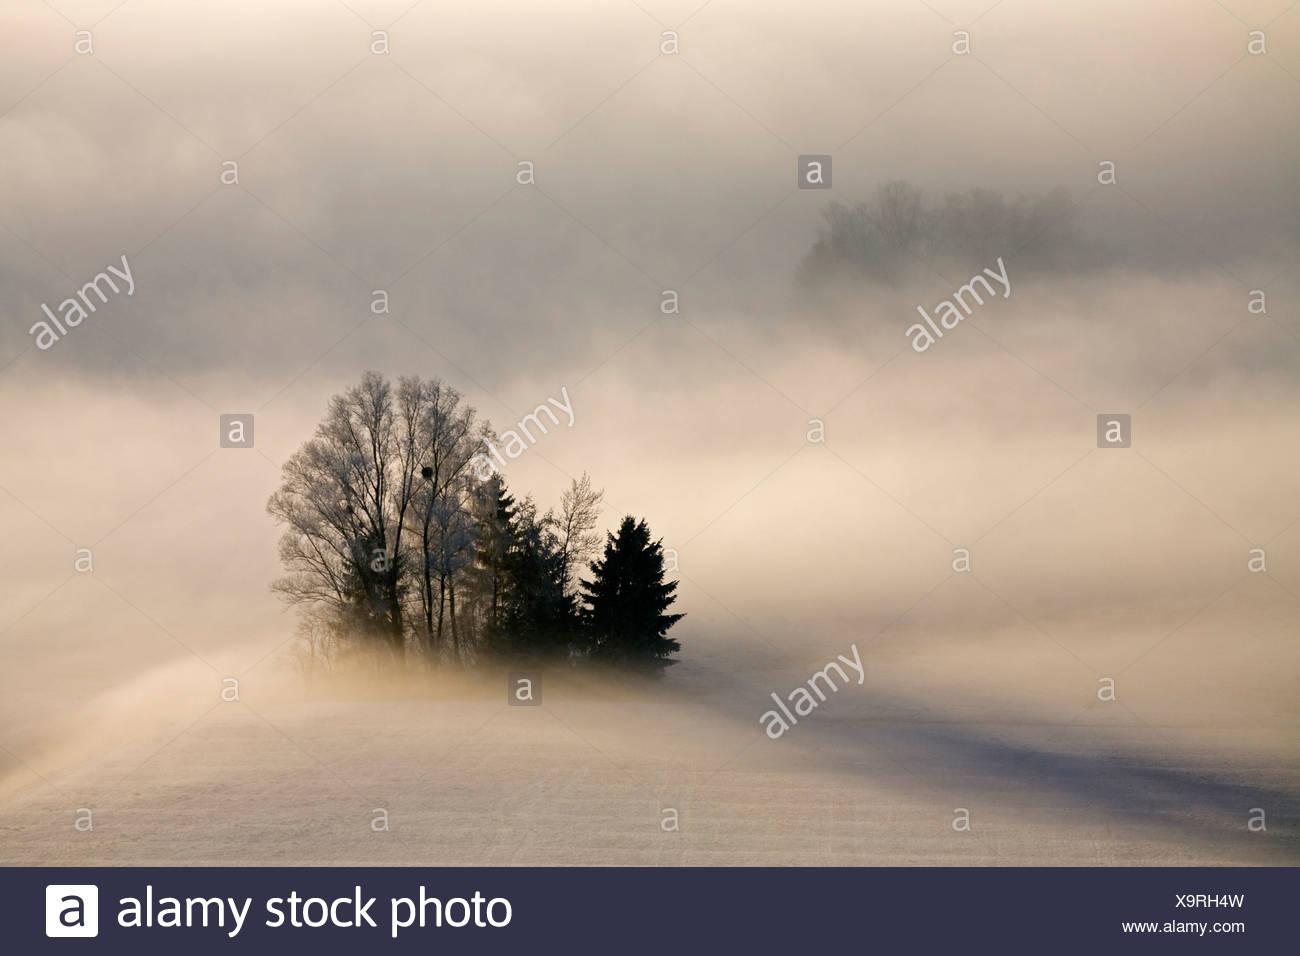 Germany, Bavaria, Murnau, Misty landscape - Stock Image